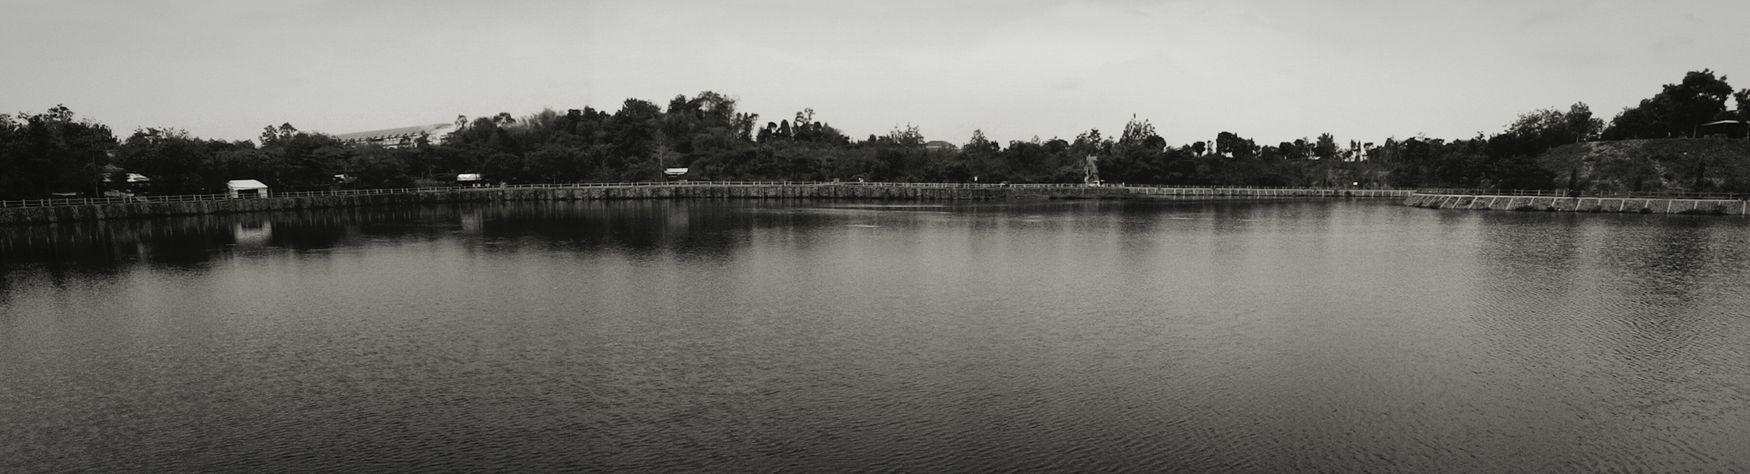 Blackandwhite Wonderful Yogyakarta Yogyakarta Story Landscape INDONESIA